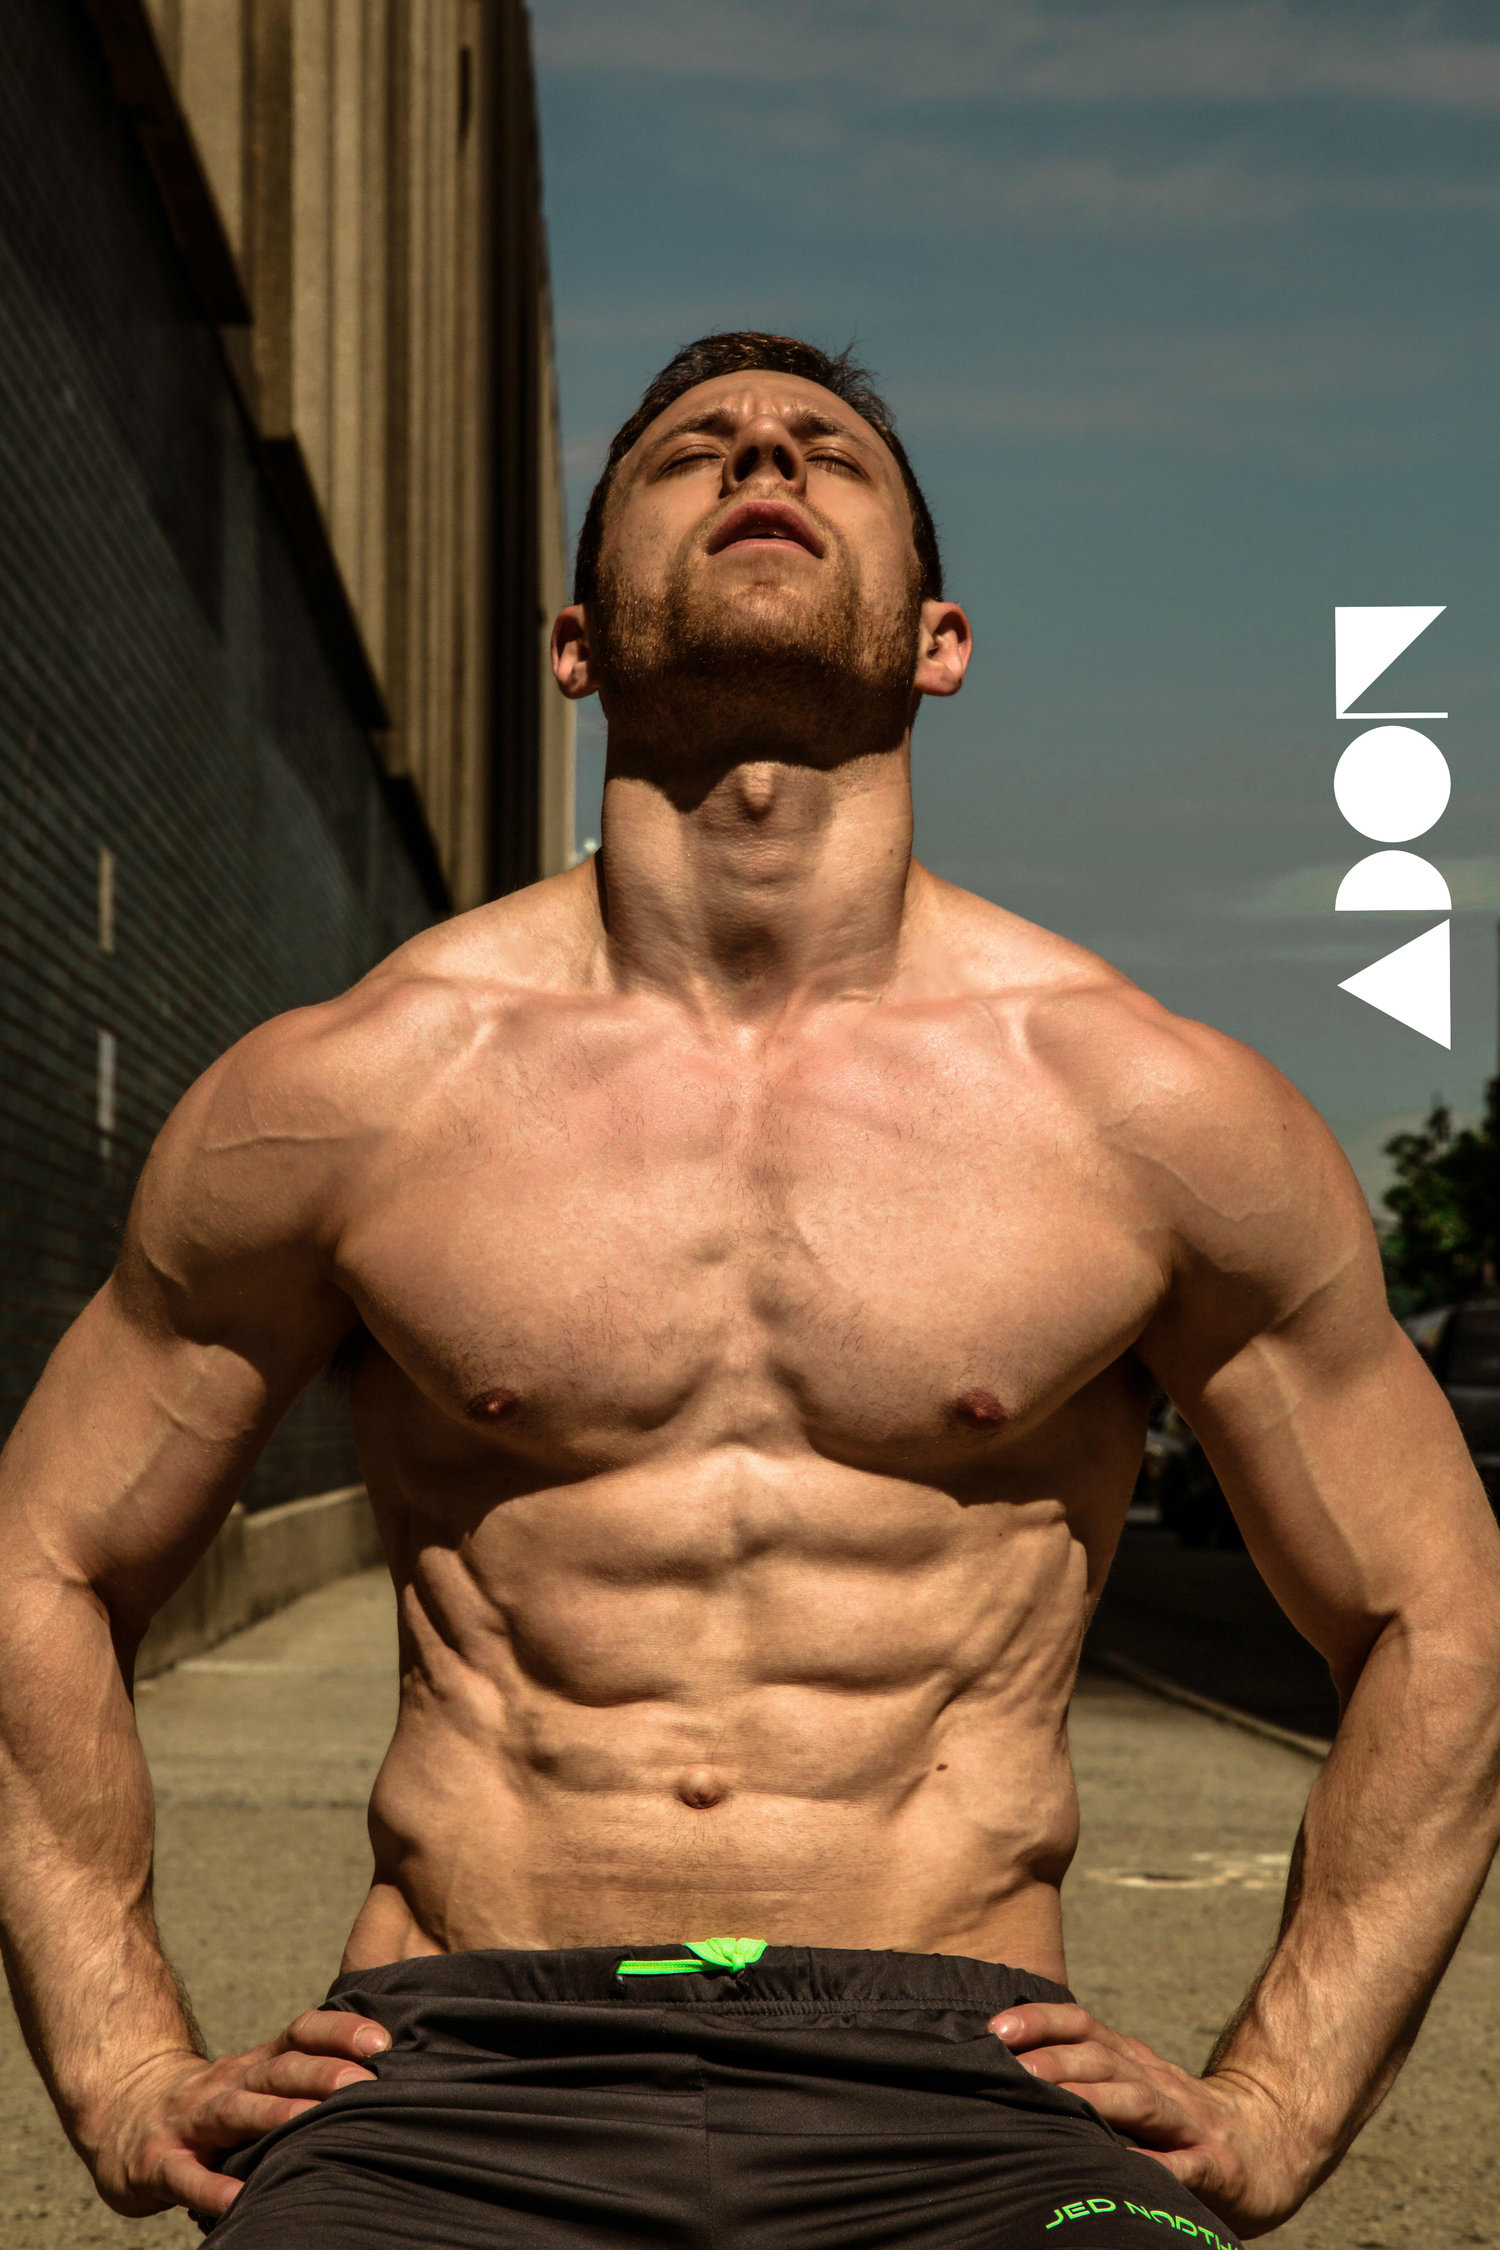 Adon Exclusive: Model Ben Unger By West Phillips